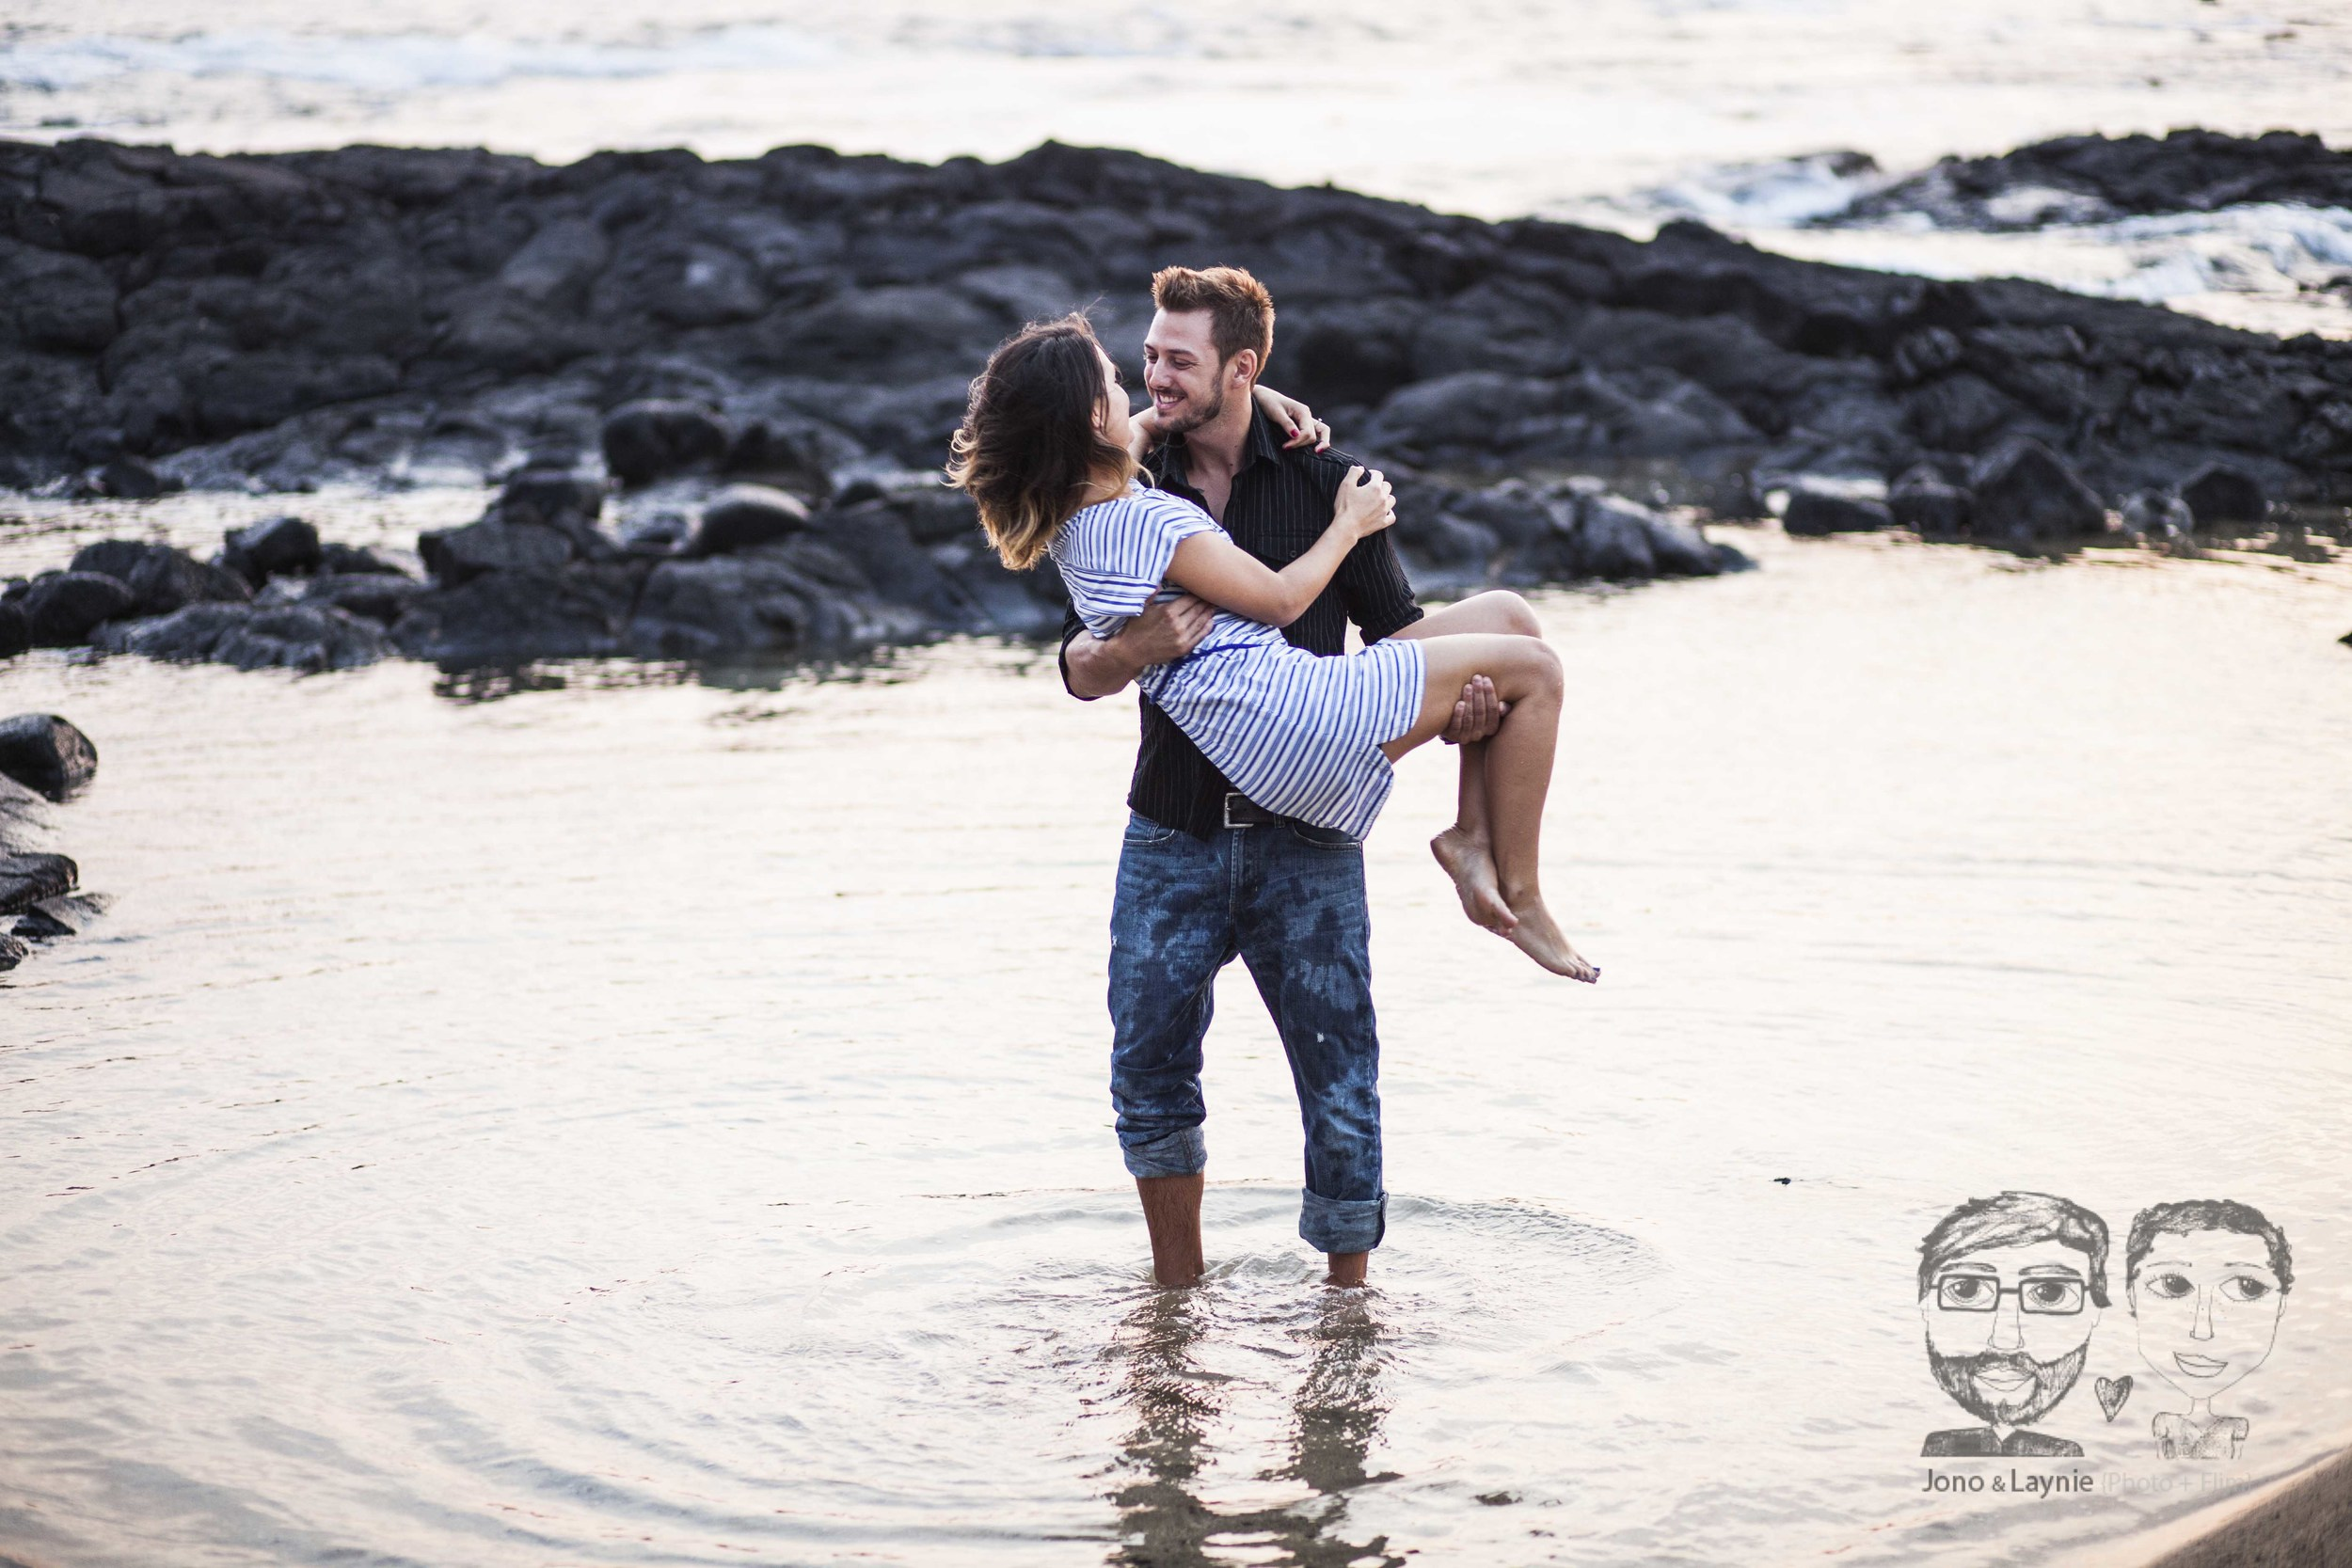 Jono & Laynie Co.-Kona, Hawaii-Engagement Session42.jpg